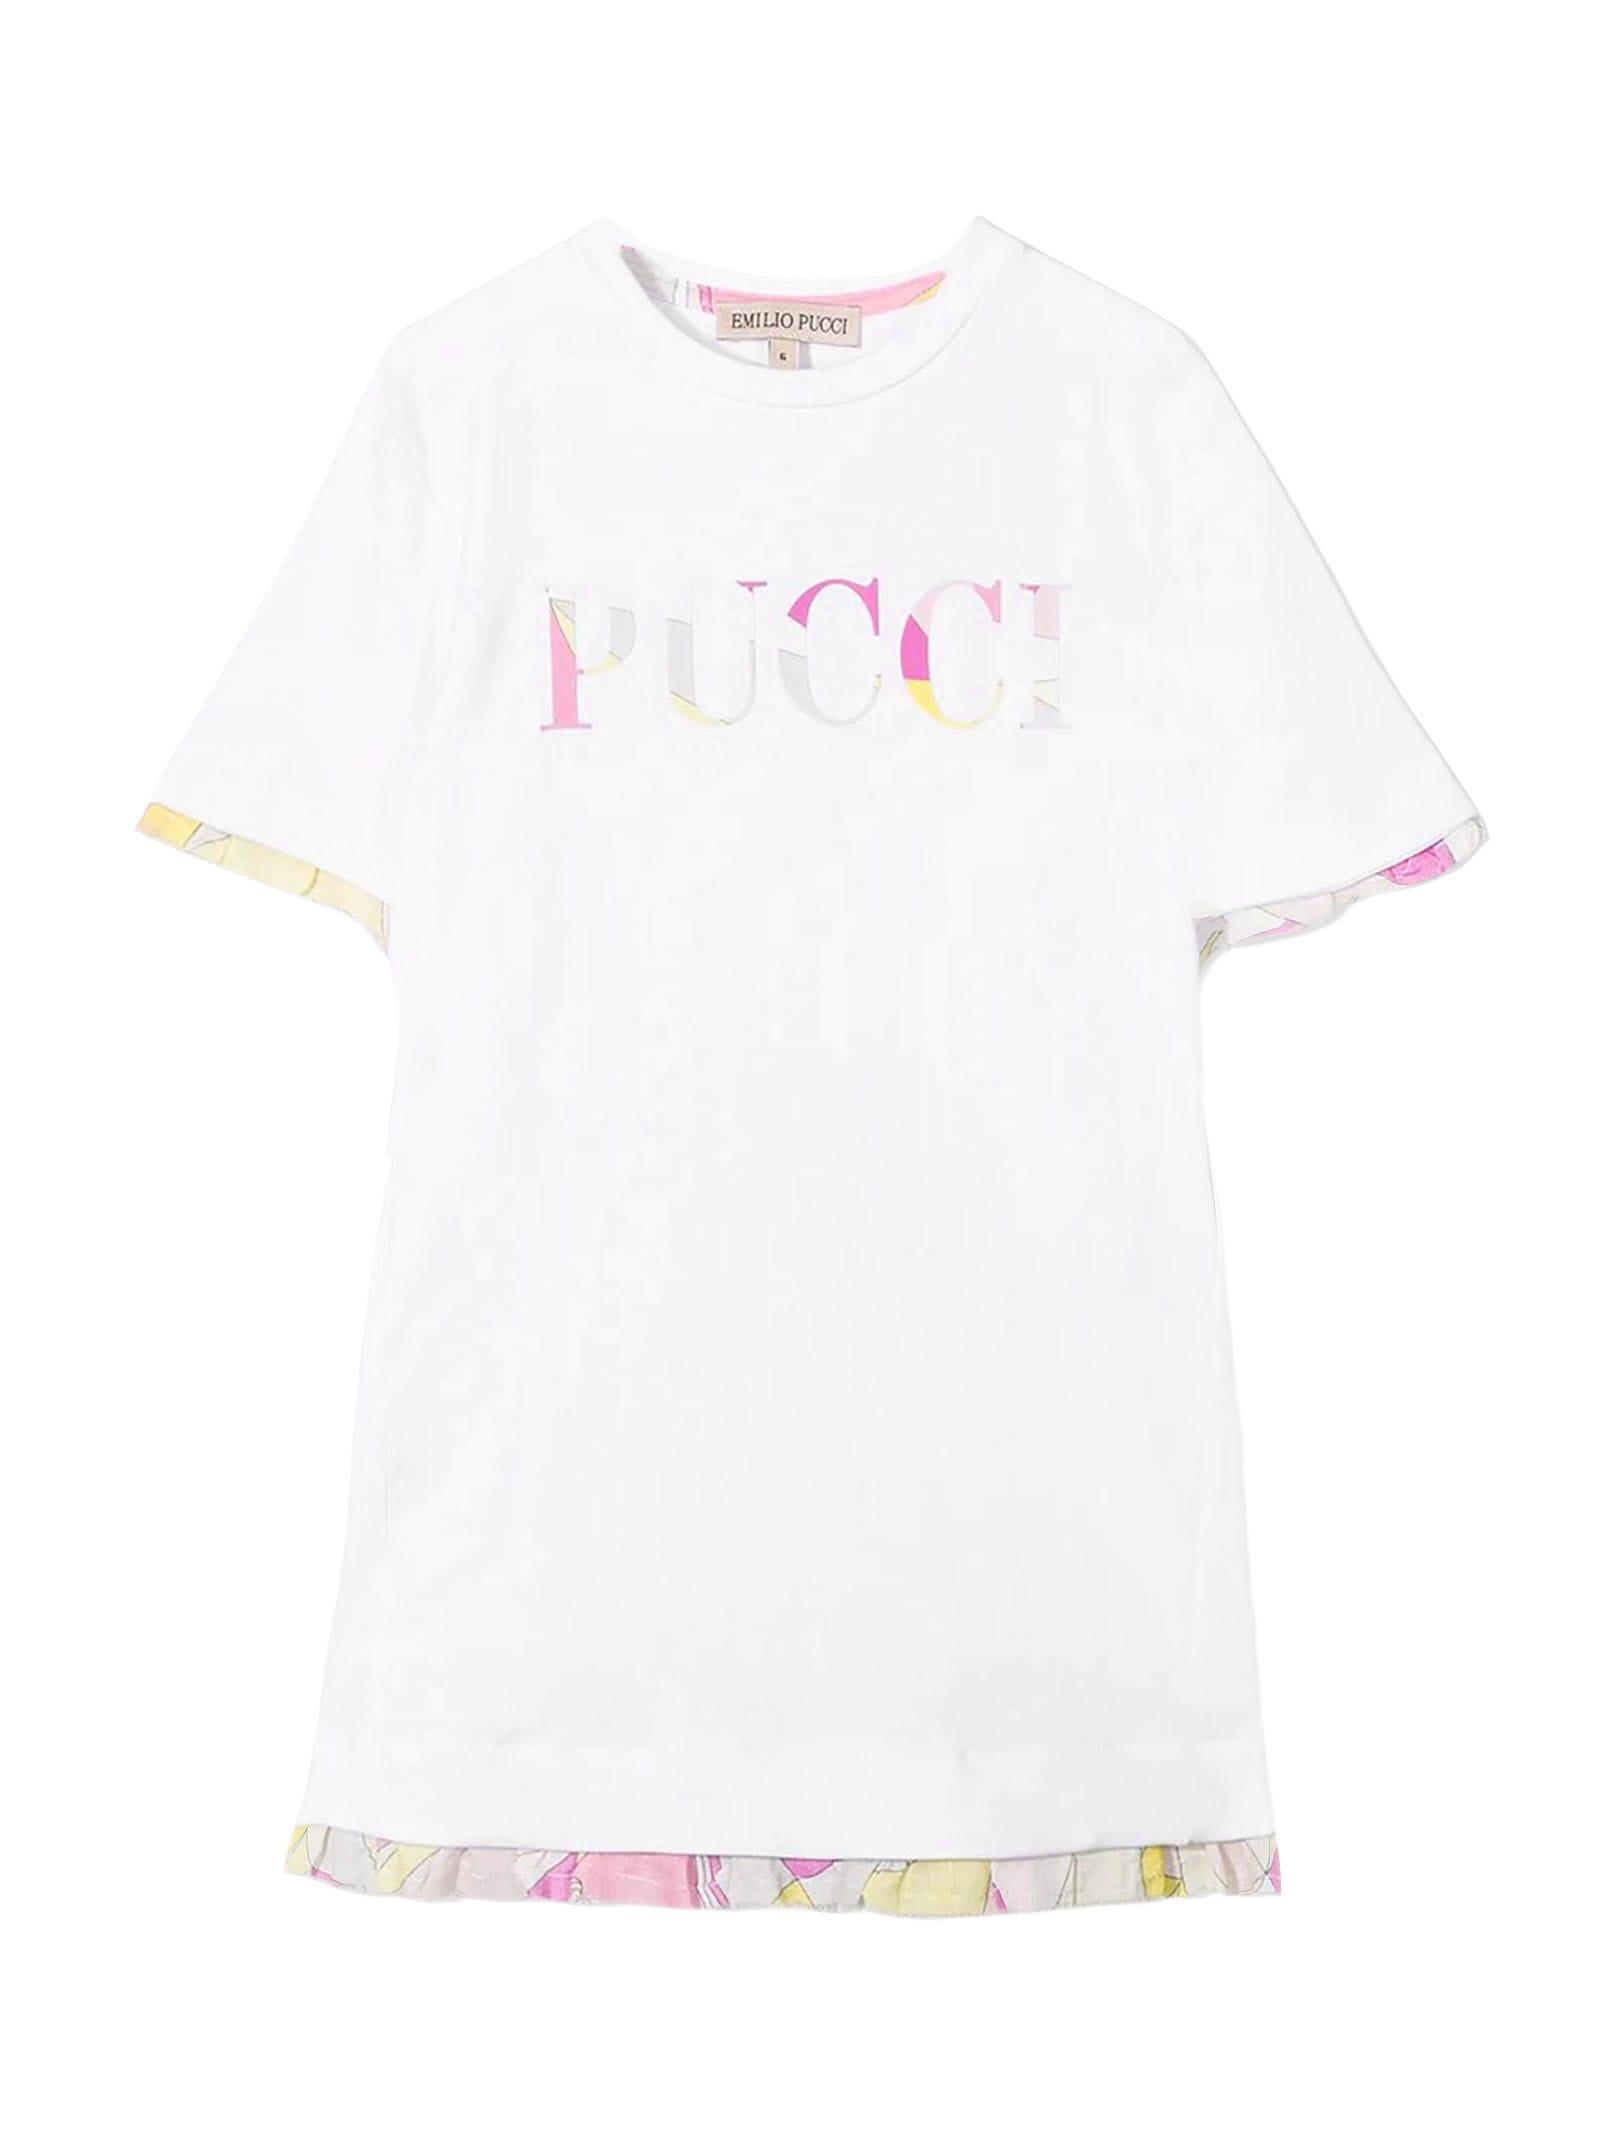 Emilio Pucci White Cotton T-shirt Dress